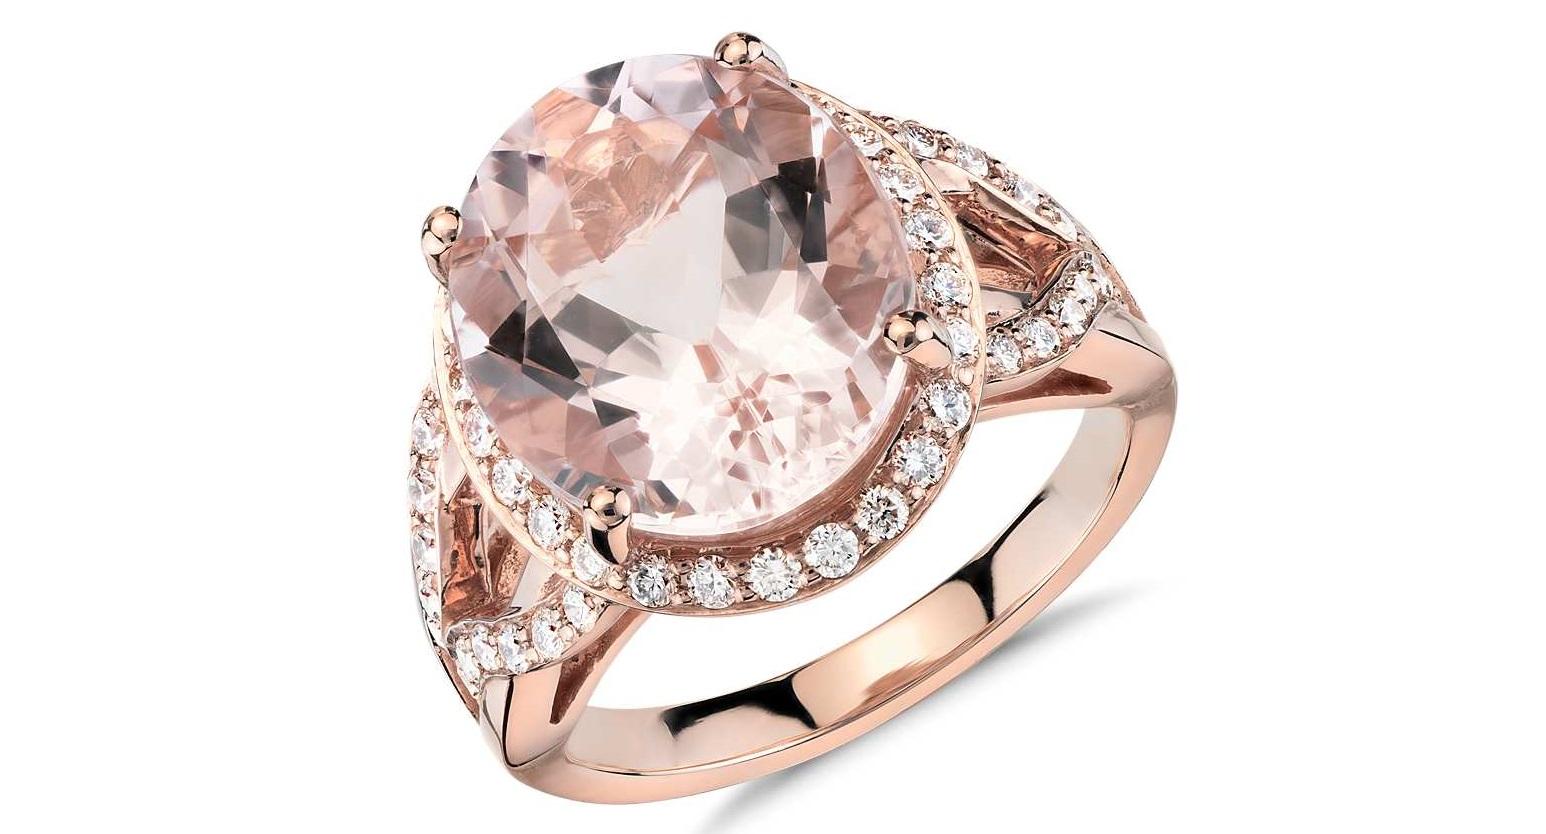 Morganite and Diamond Ring in 18k Rose Gold (13x11mm)